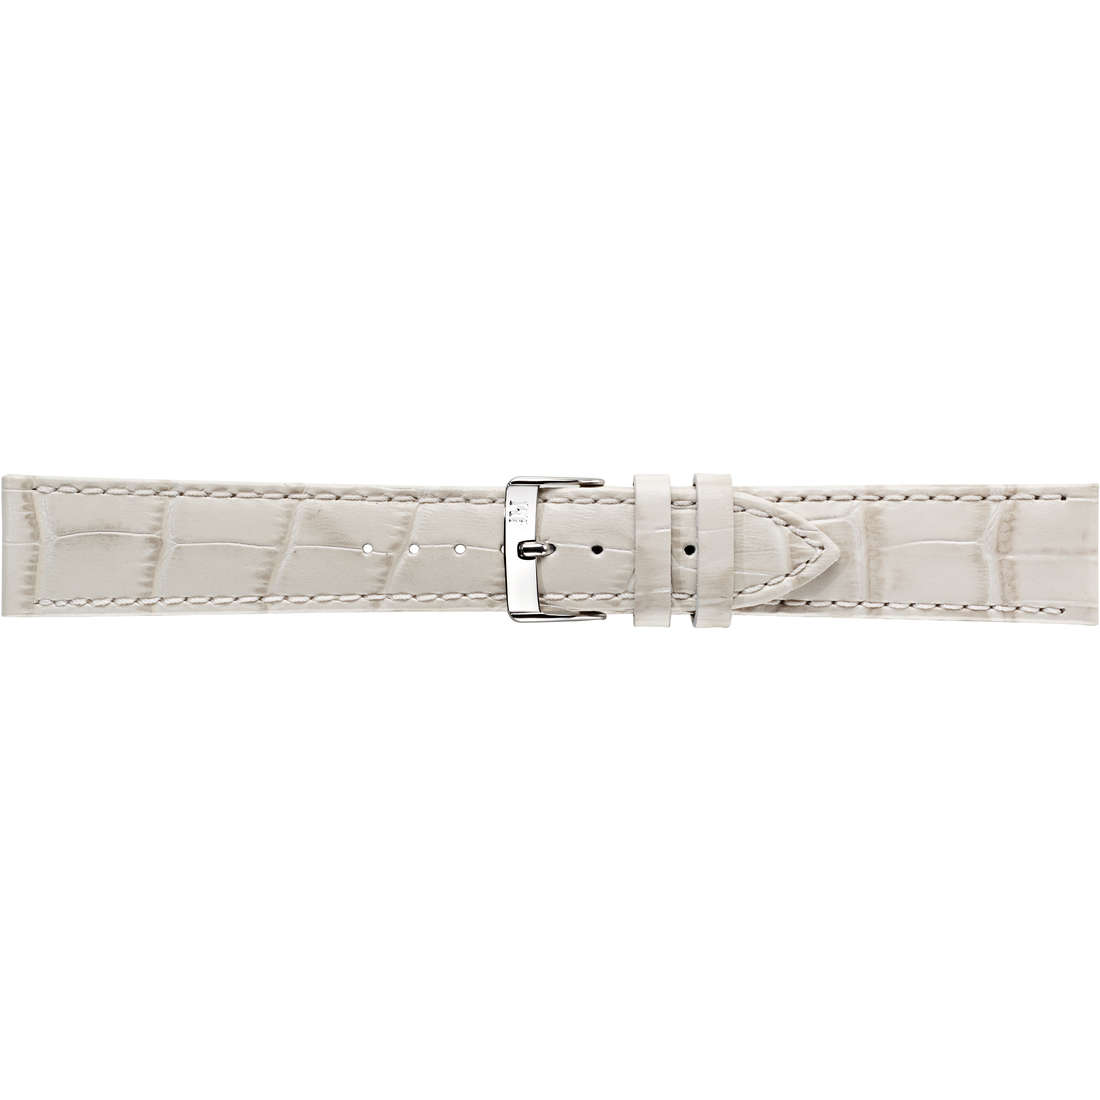 watch watch bands watch straps man Morellato Morellato 1930 A01X2269480026CR14